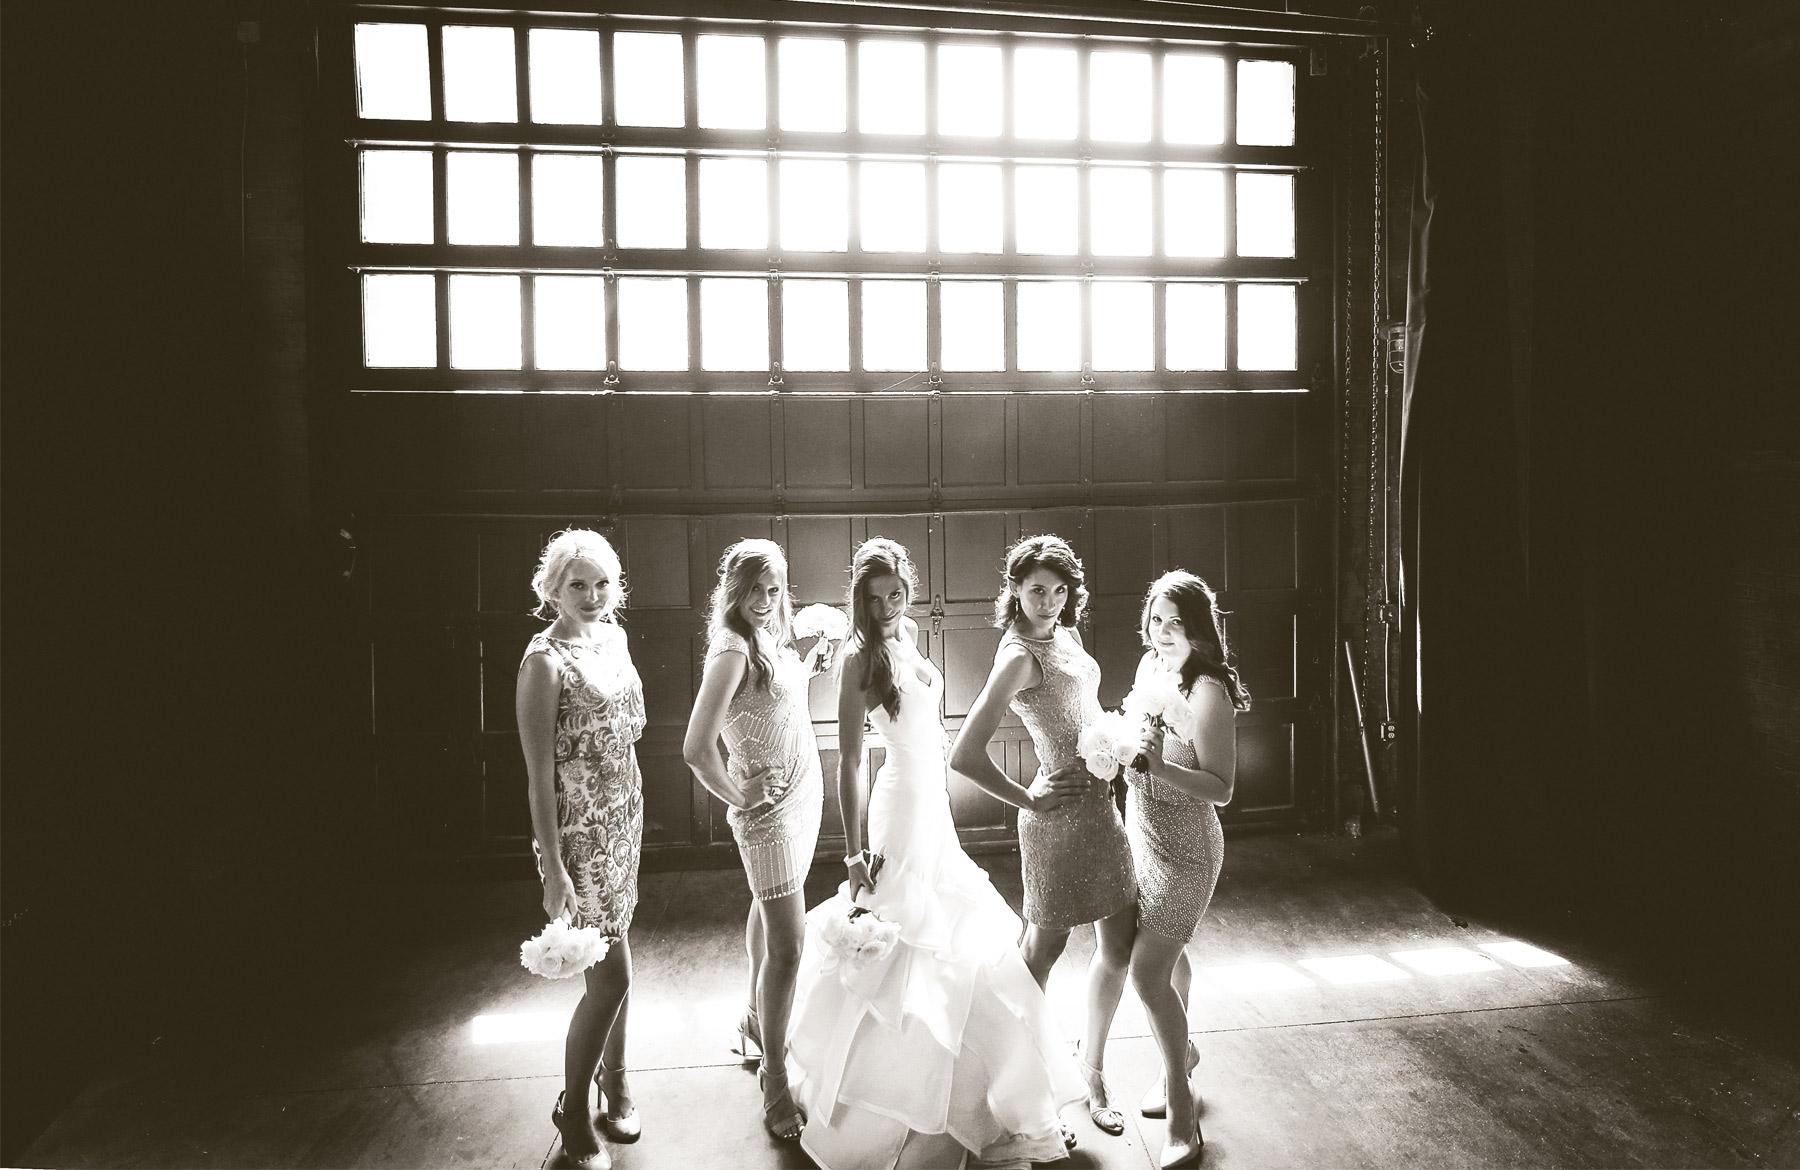 14-Minneapolis-Minnesota-Wedding-Photography-by-Vick-Photography-Aria-Wedding-Party-Katie-&-Joe.jpg